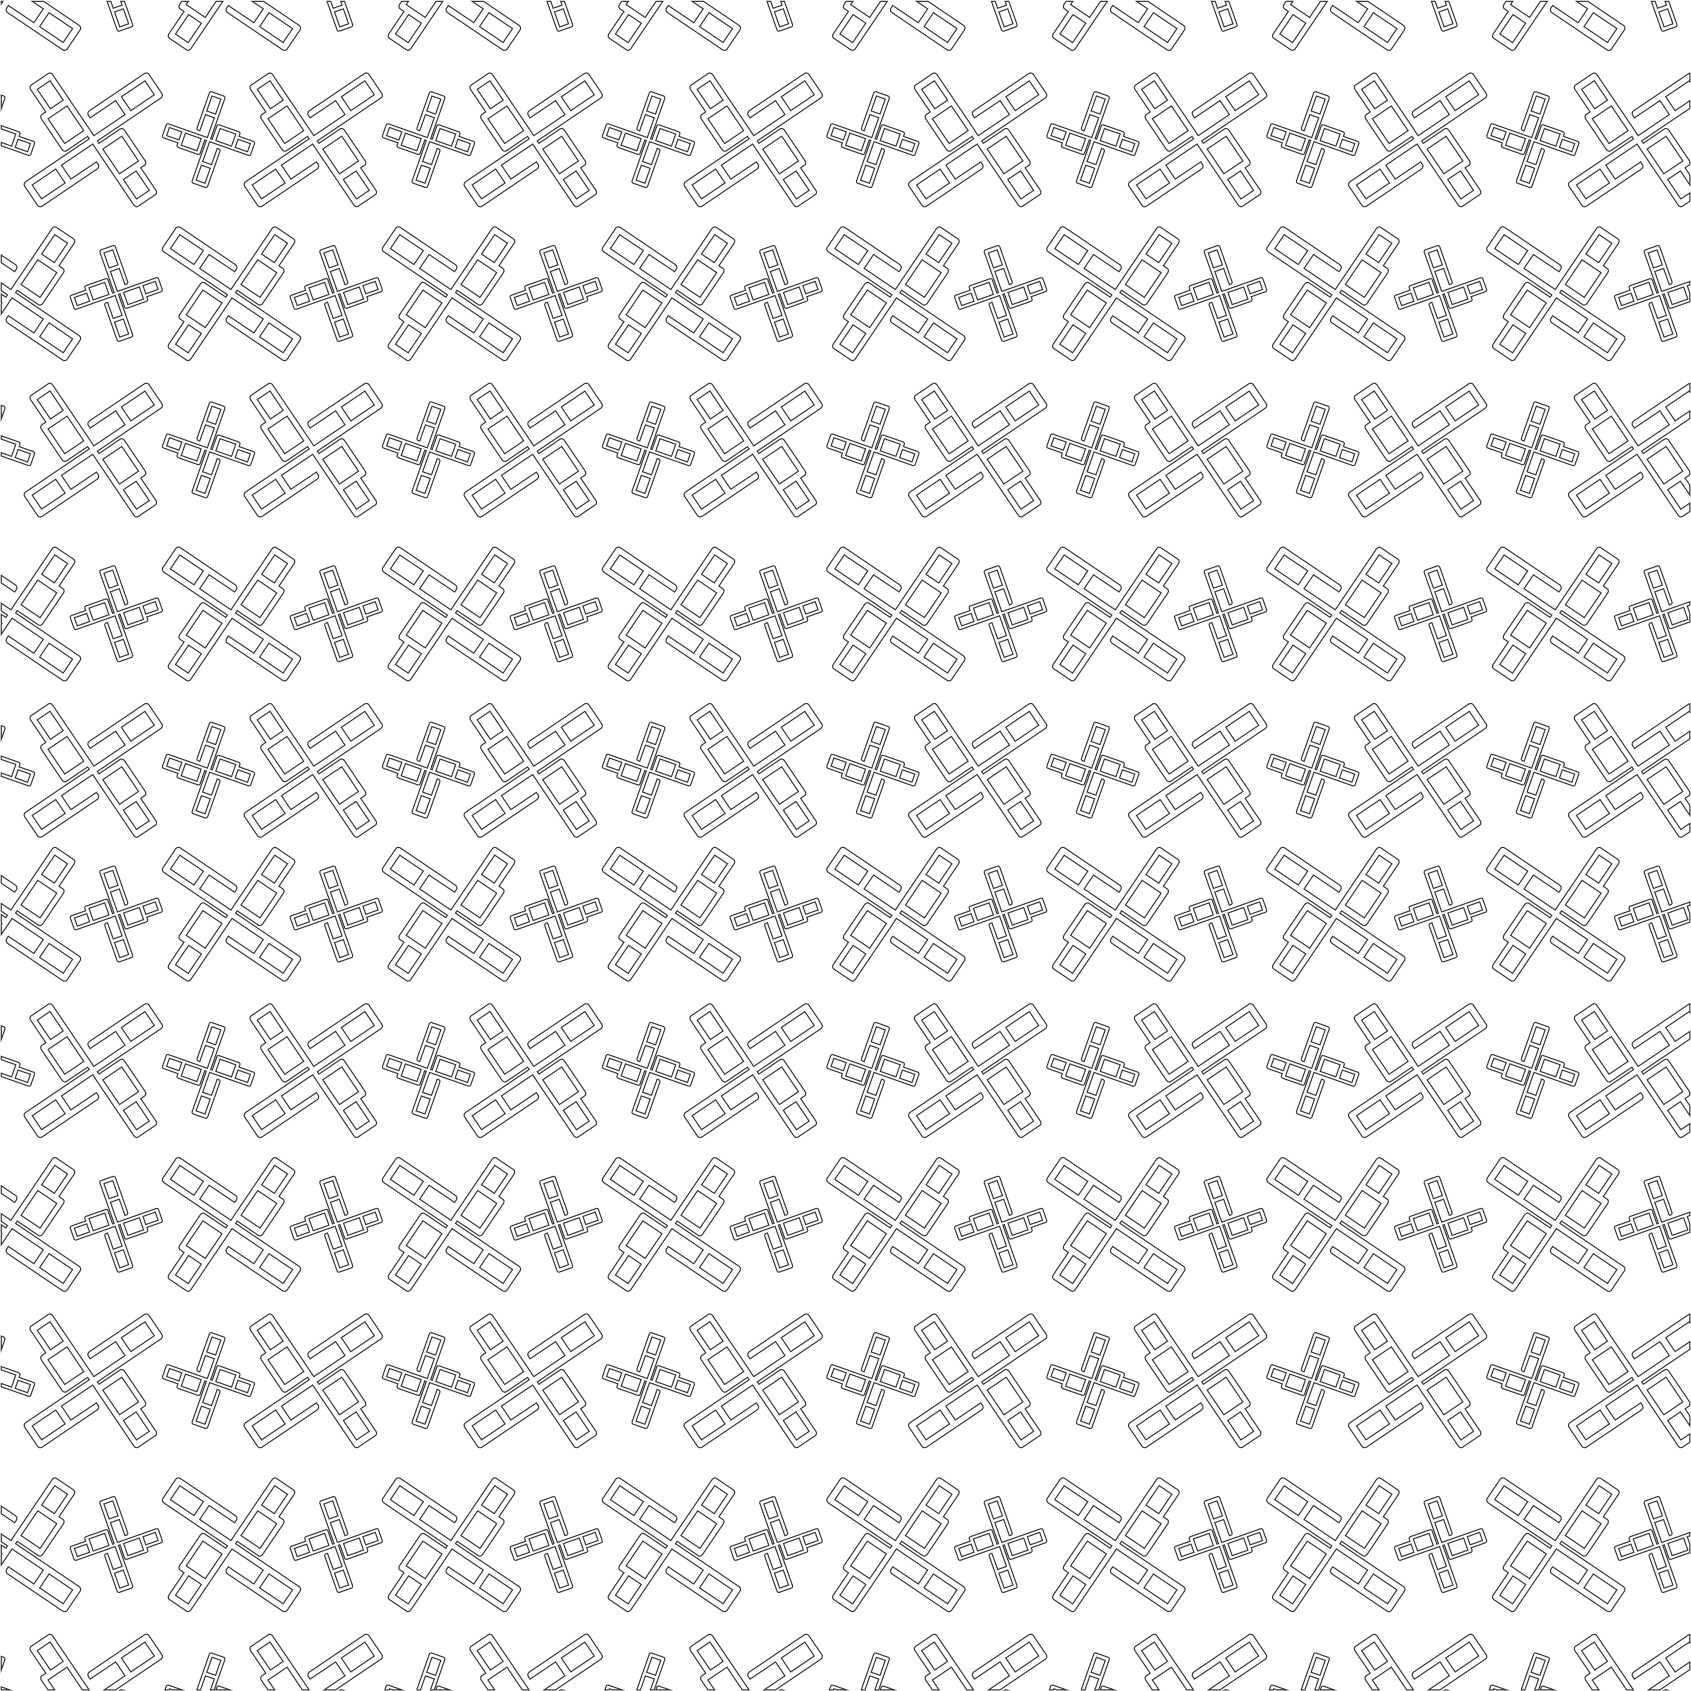 ТЗ на разработку пакета айдентики Agro.Broker фото f_644596864b04dcd4.jpg